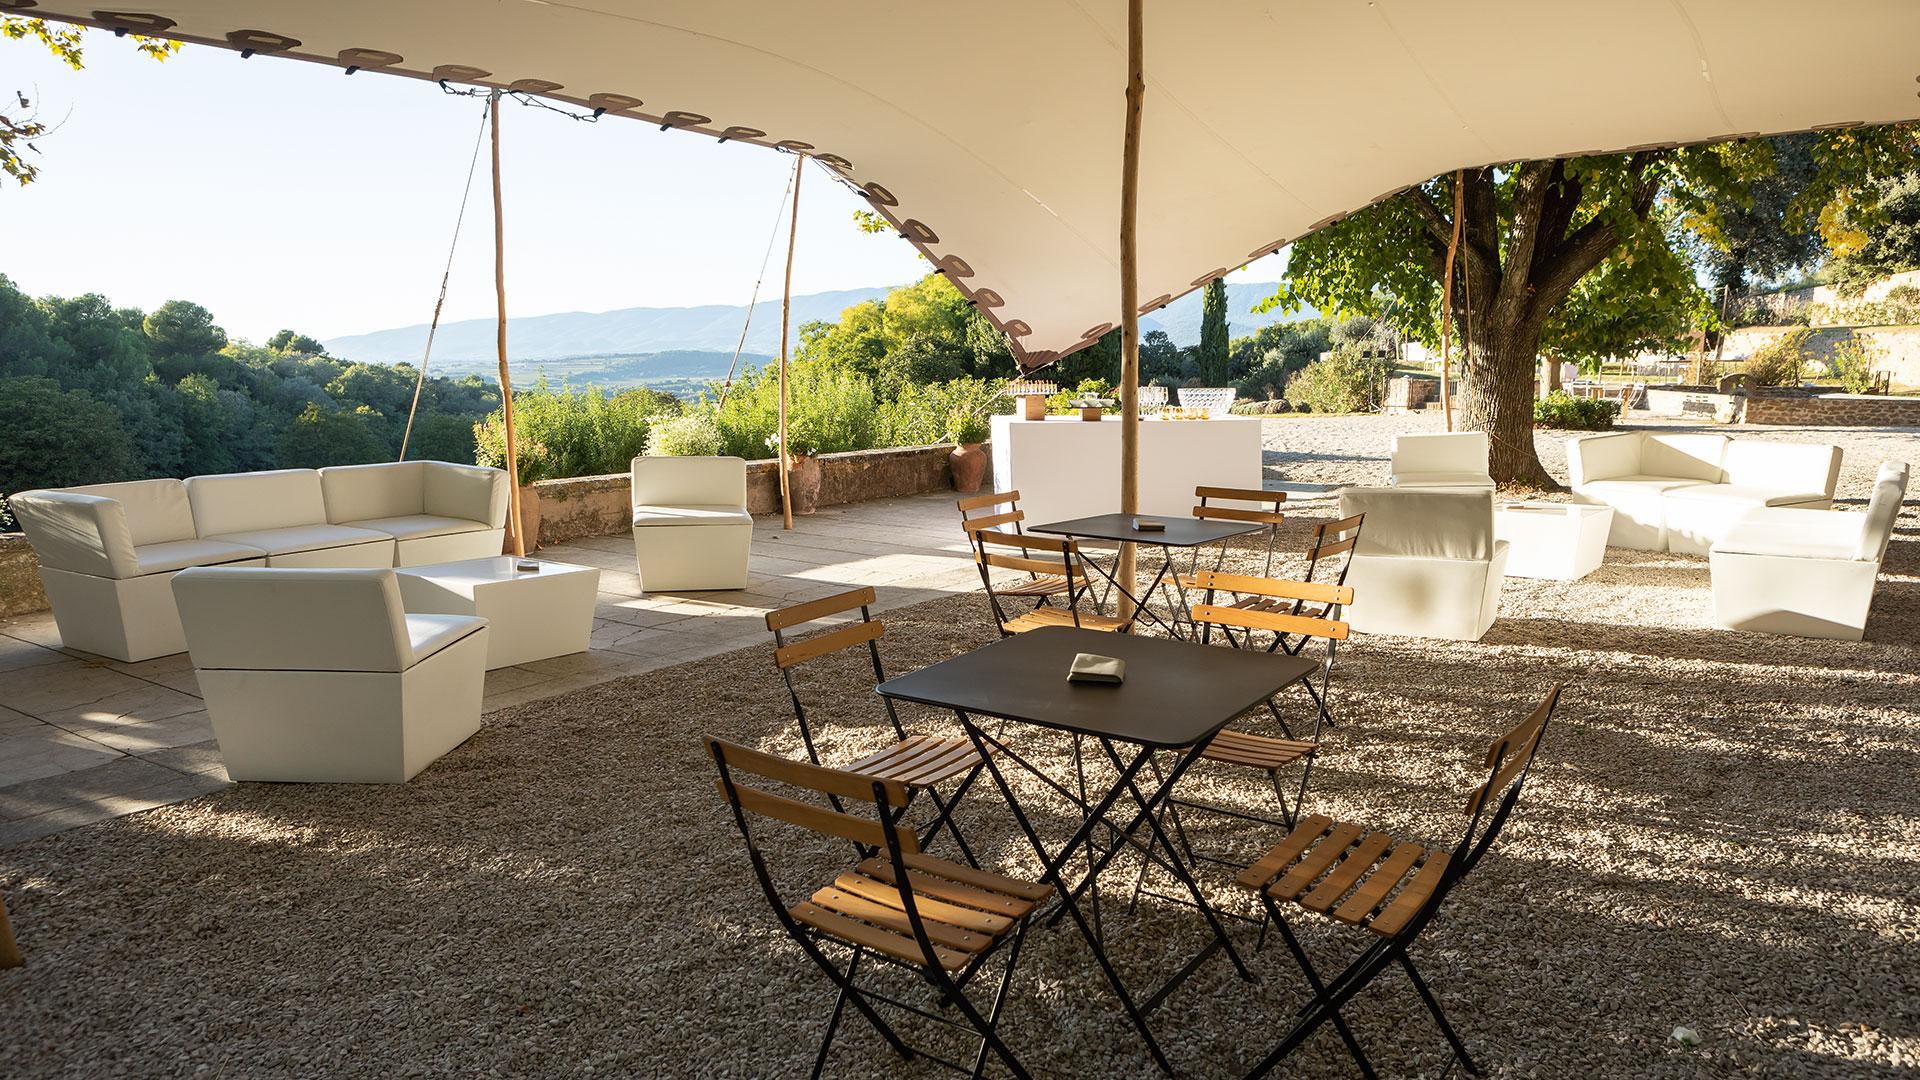 Bambou Tente Brasserie-Salon De Chapiteau-Salon De Jardin ... dedans Salon De Jardin Bambou